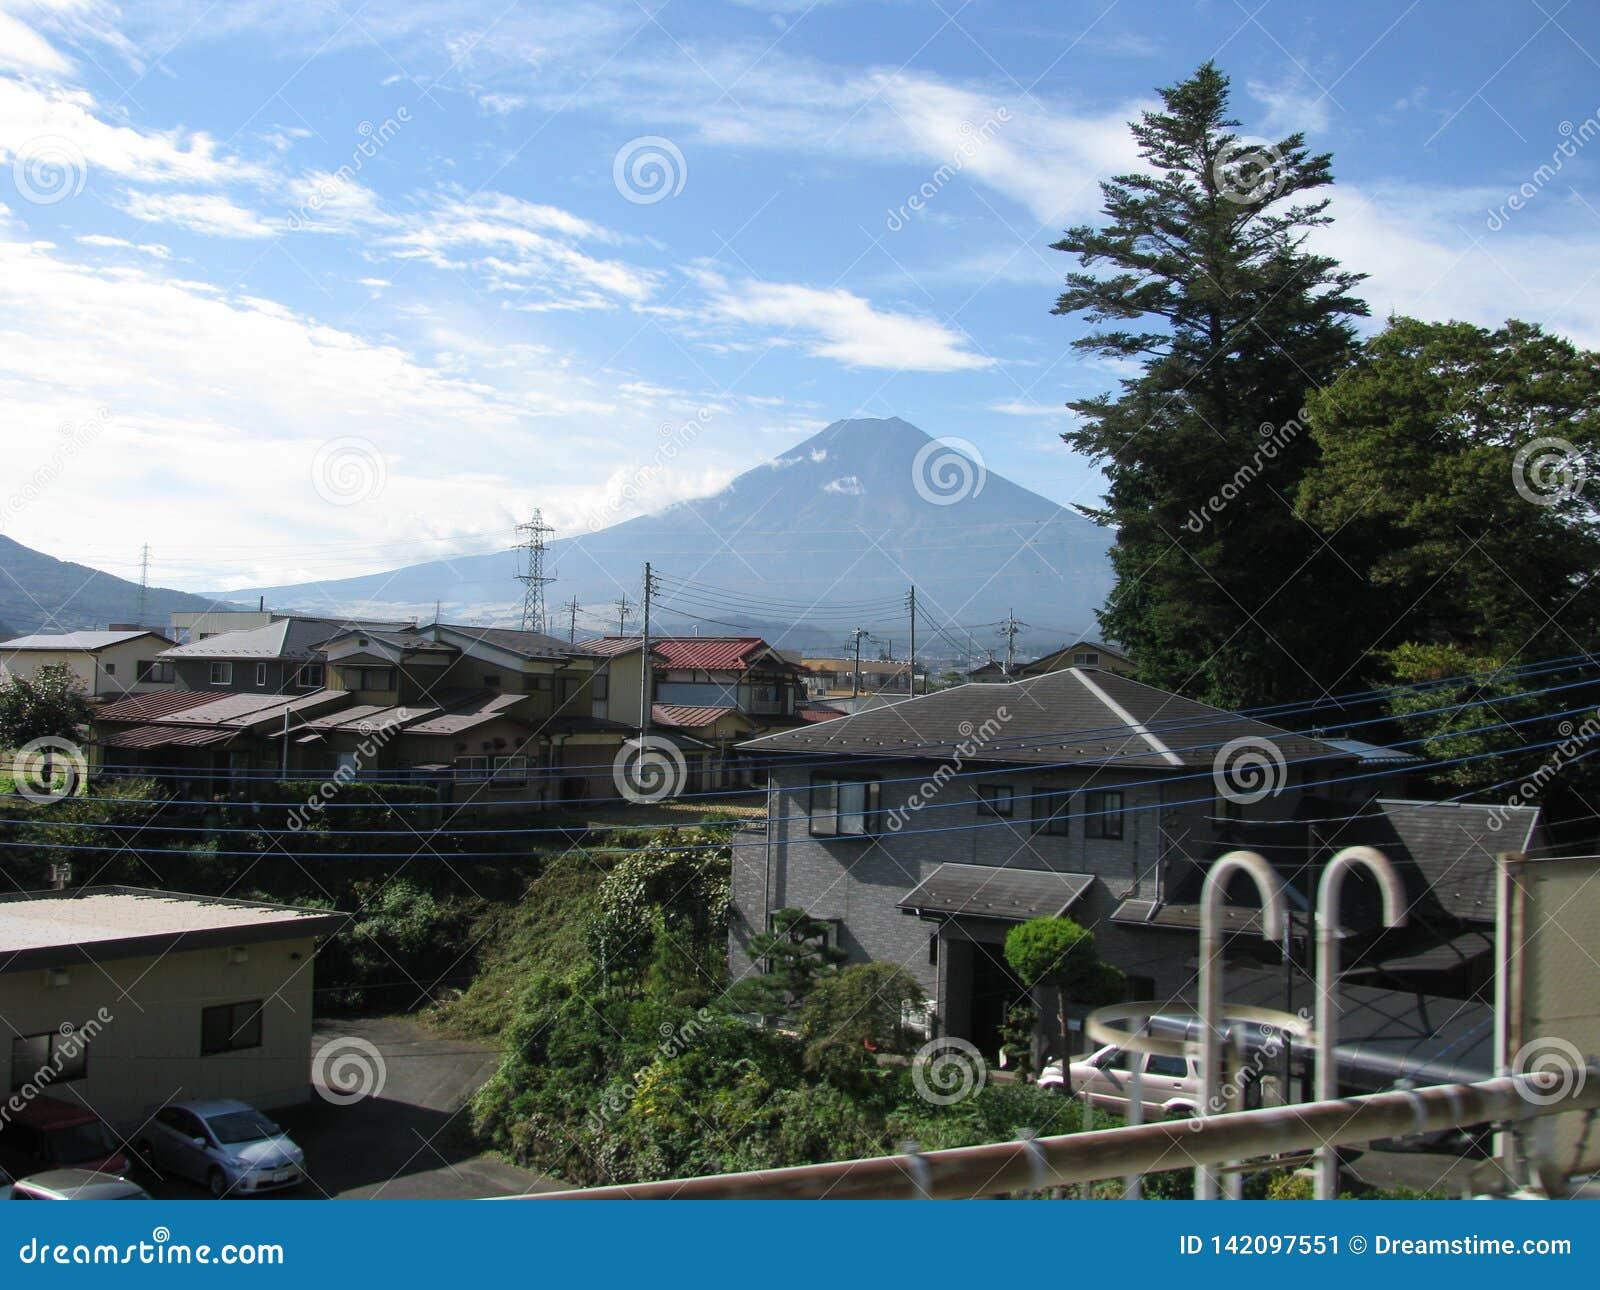 Scenery of magnificent Mt. Fuji